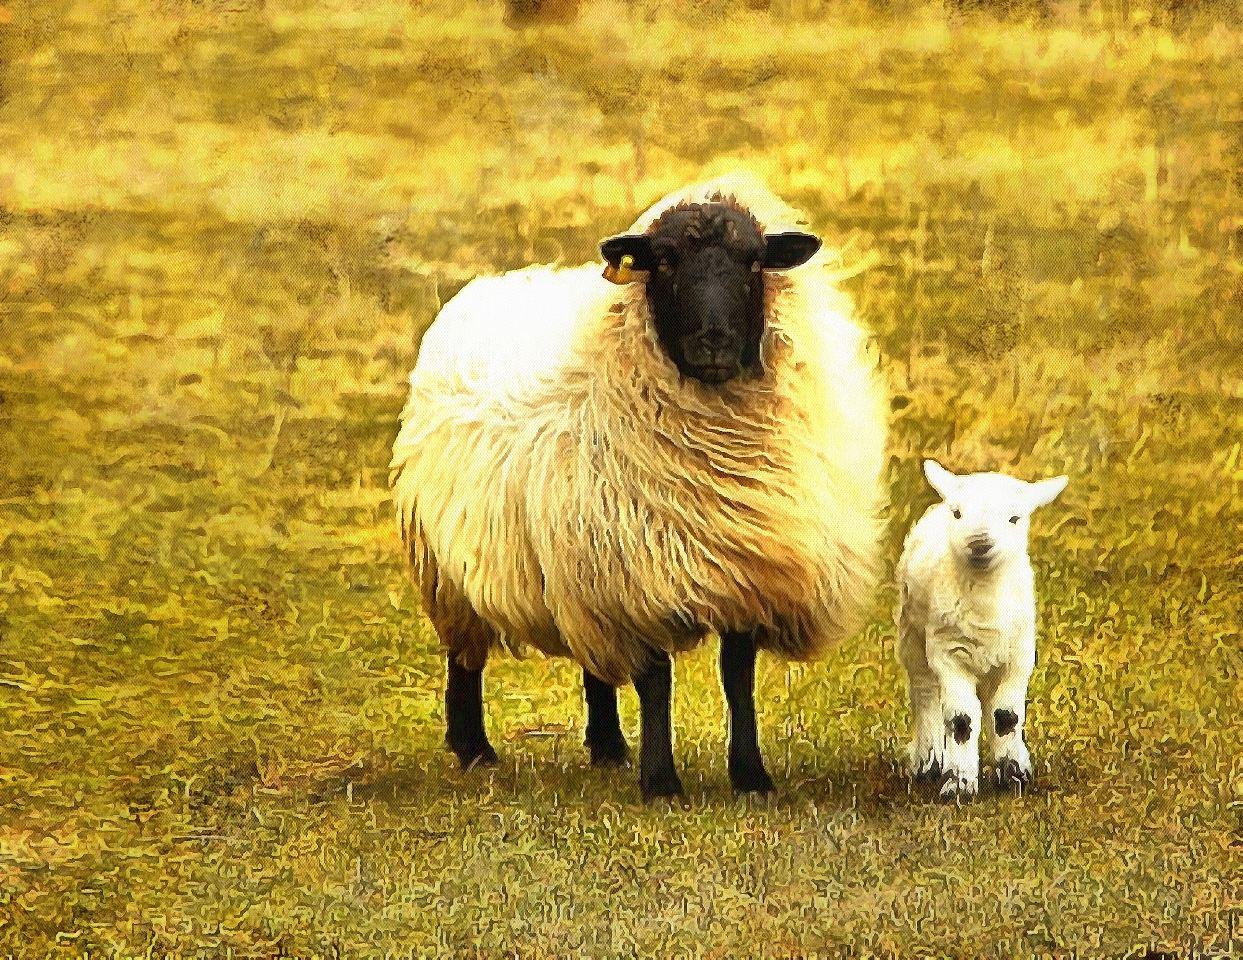 Baby animals photos, photos of small animals, - Public domainCute baby animals, images of cute baby animals. Public Domain, Animals baby pictures, baby animals free images - Stock Free Images - Public domain!